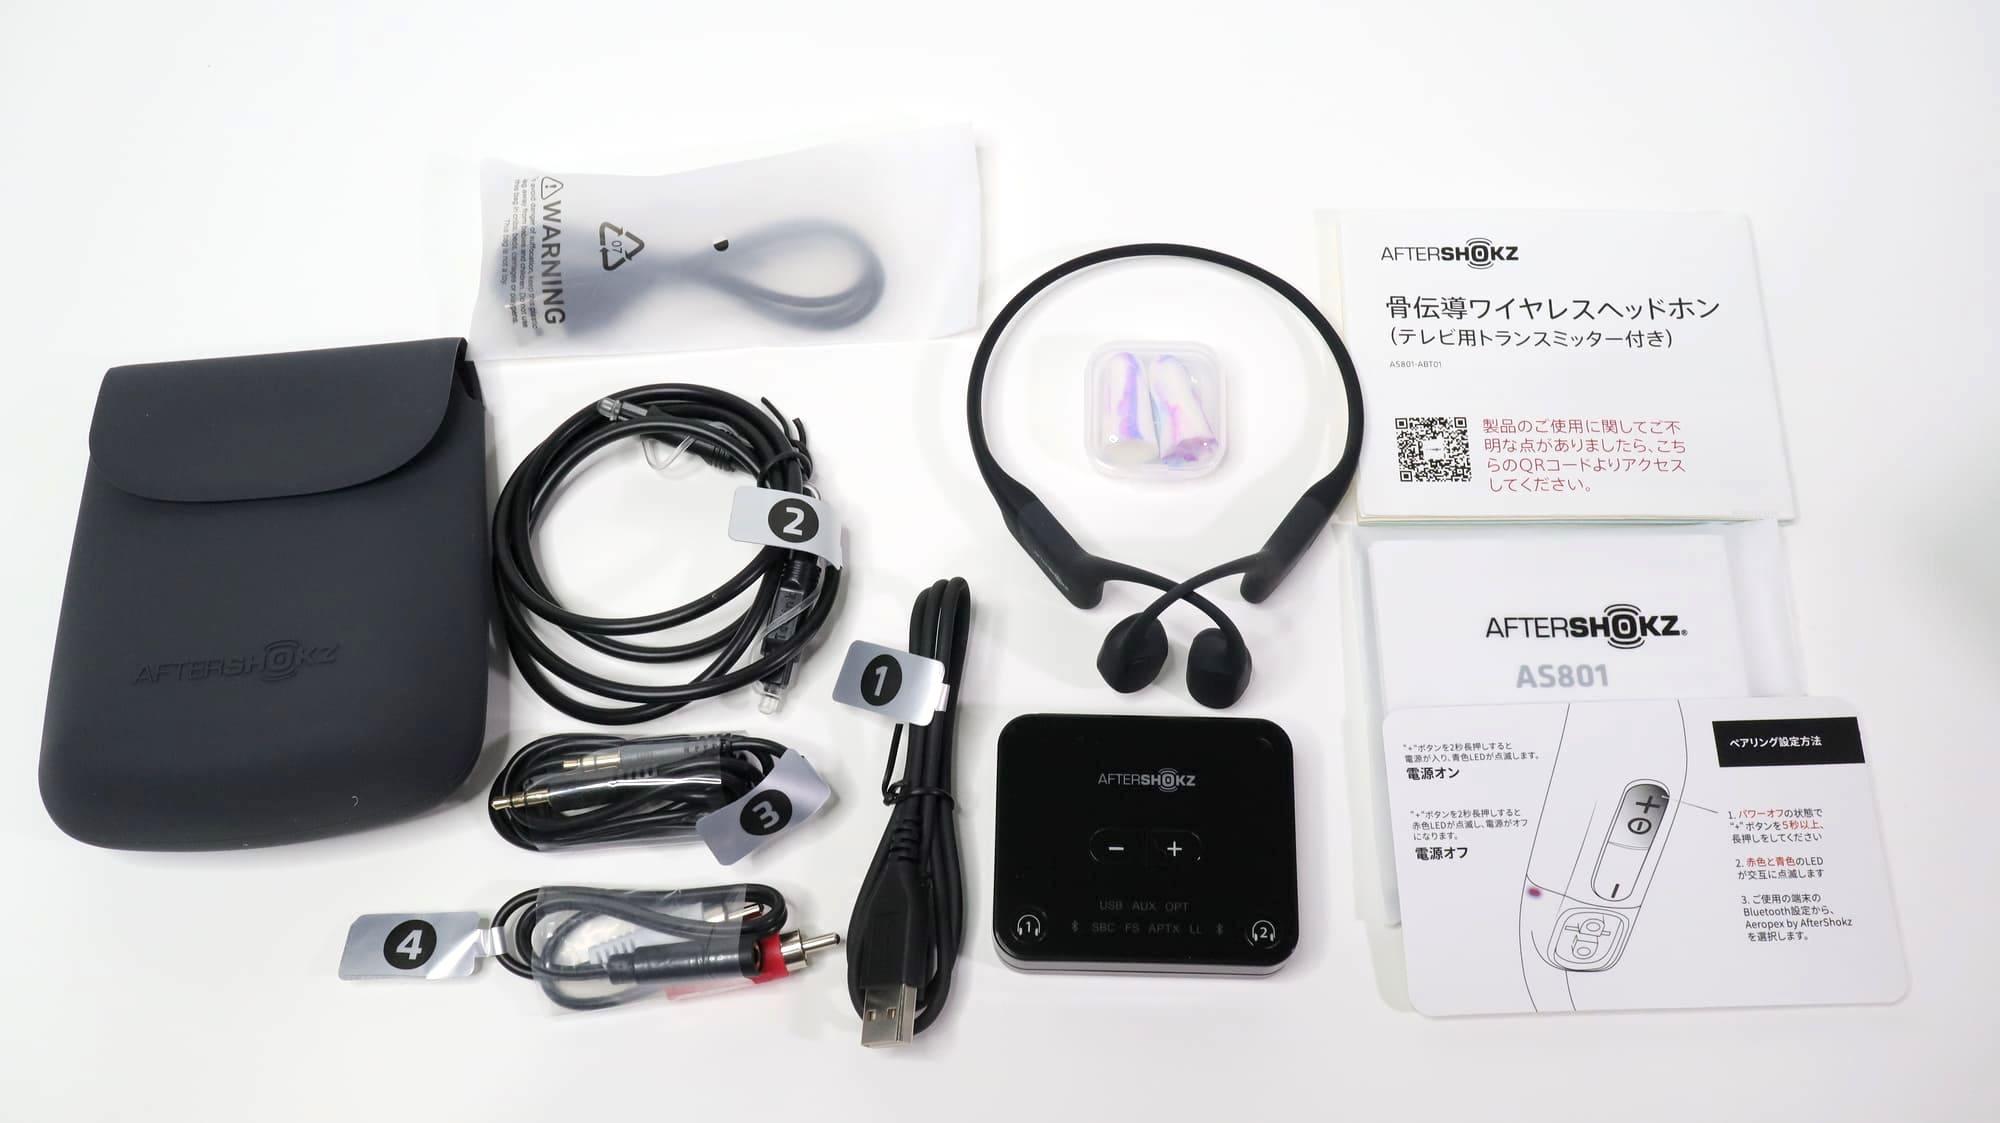 AfterShokz 骨伝導ワイヤレスヘッドホン テレビ用の同梱品